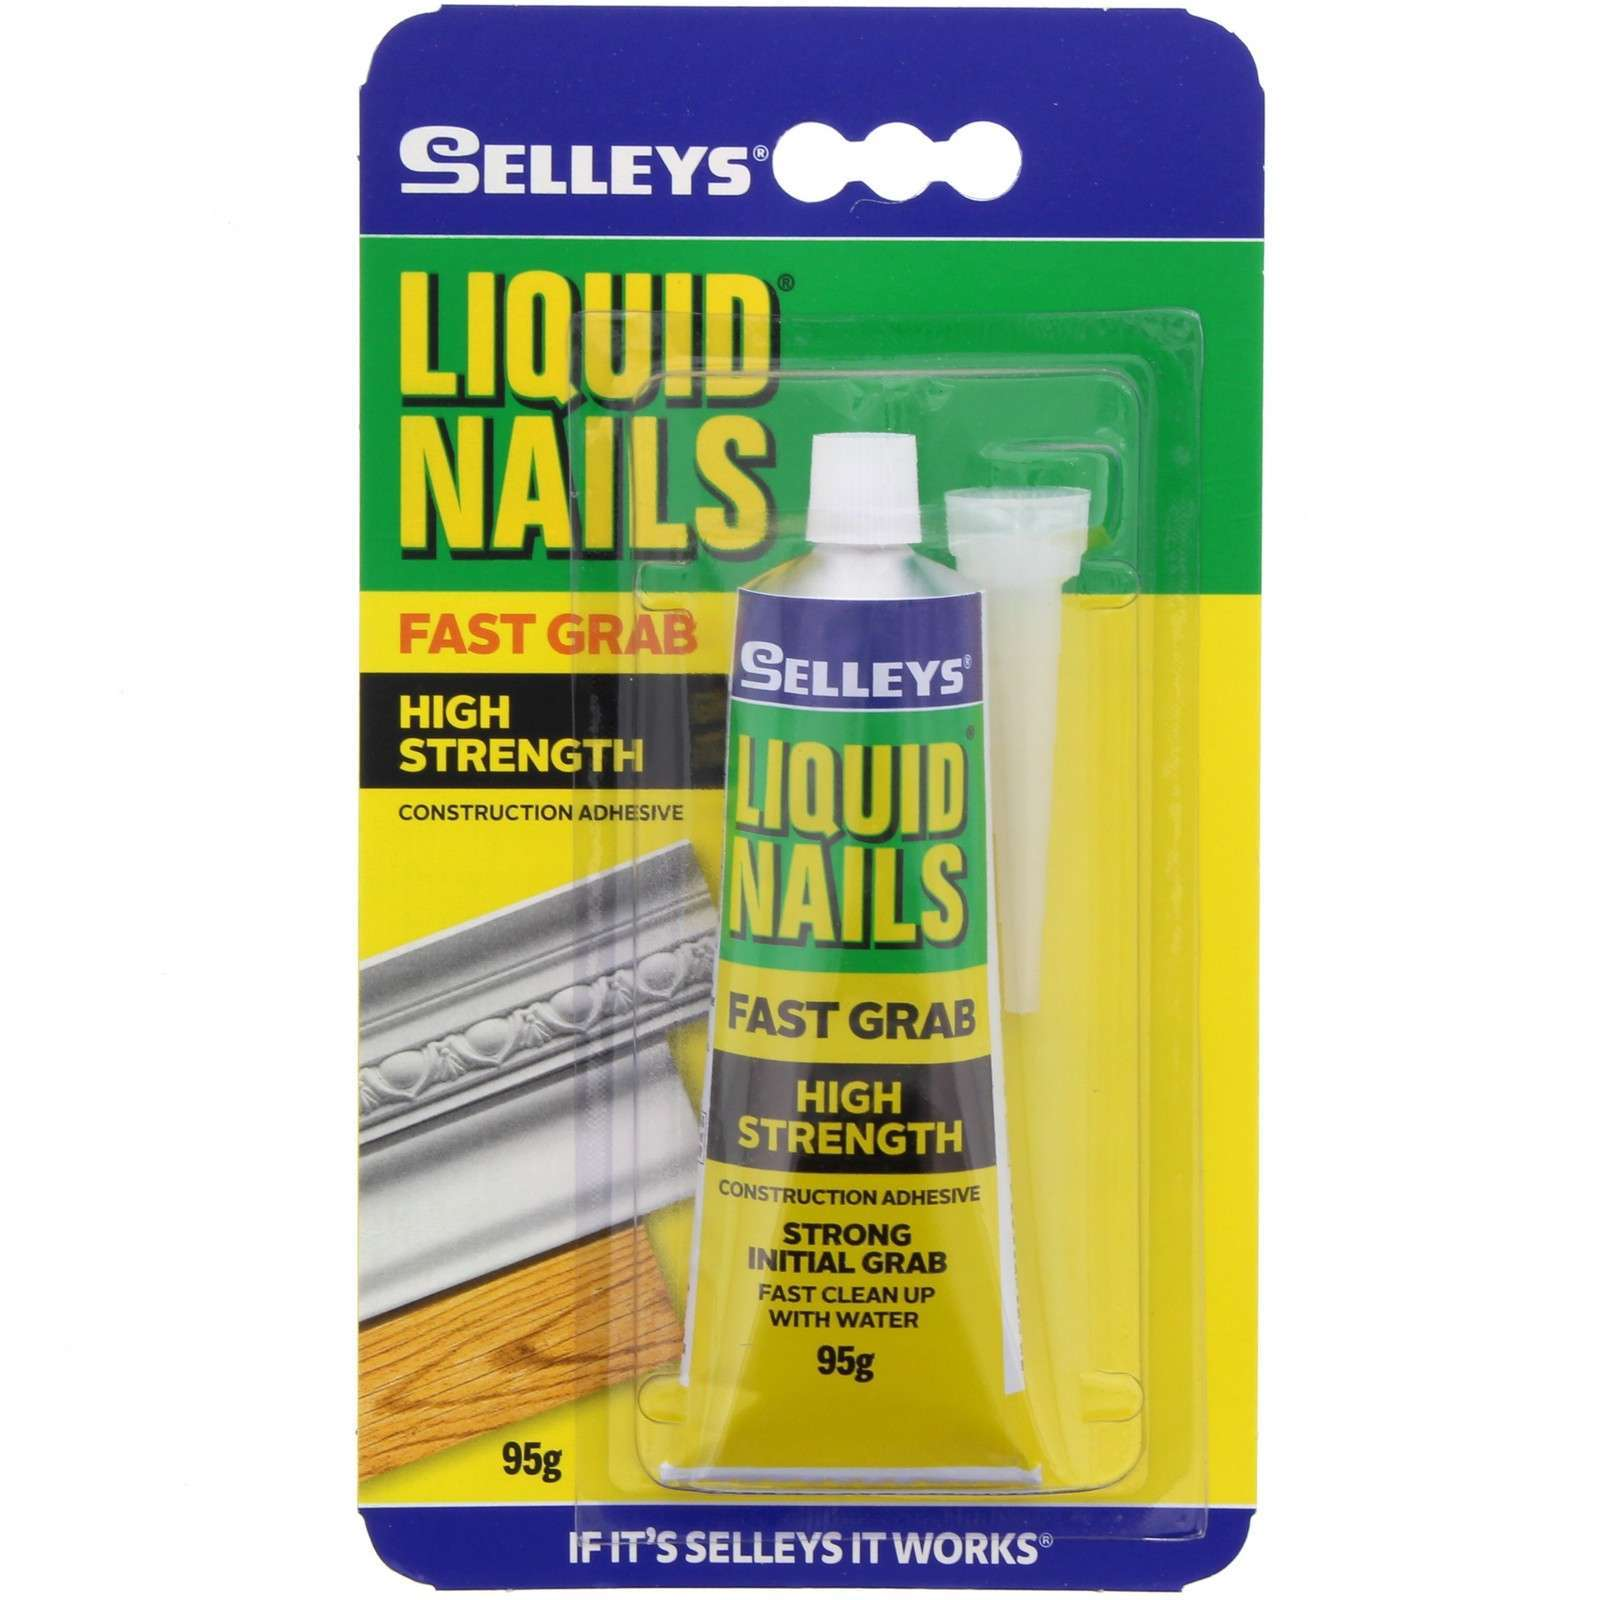 Liquid Nails Glue Fast Grab High Strength Construction Adhesive Selleys 95g